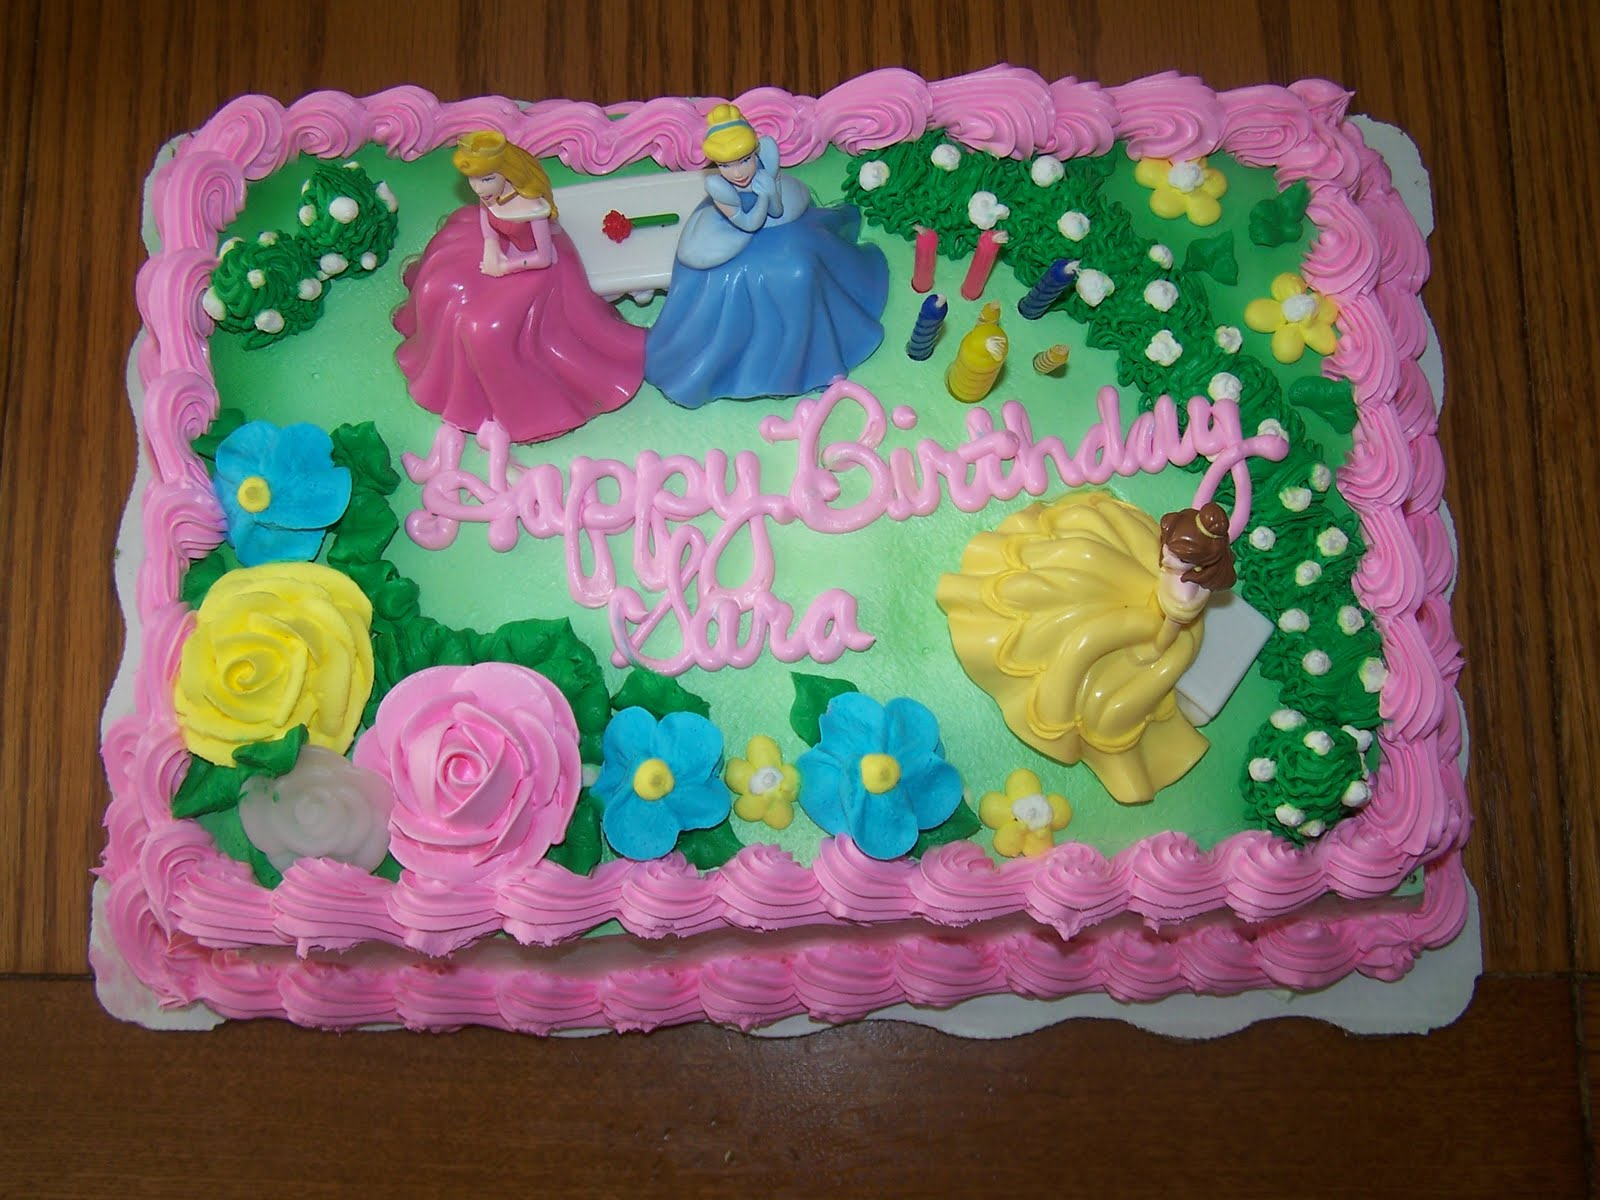 Happy Birthday Sara